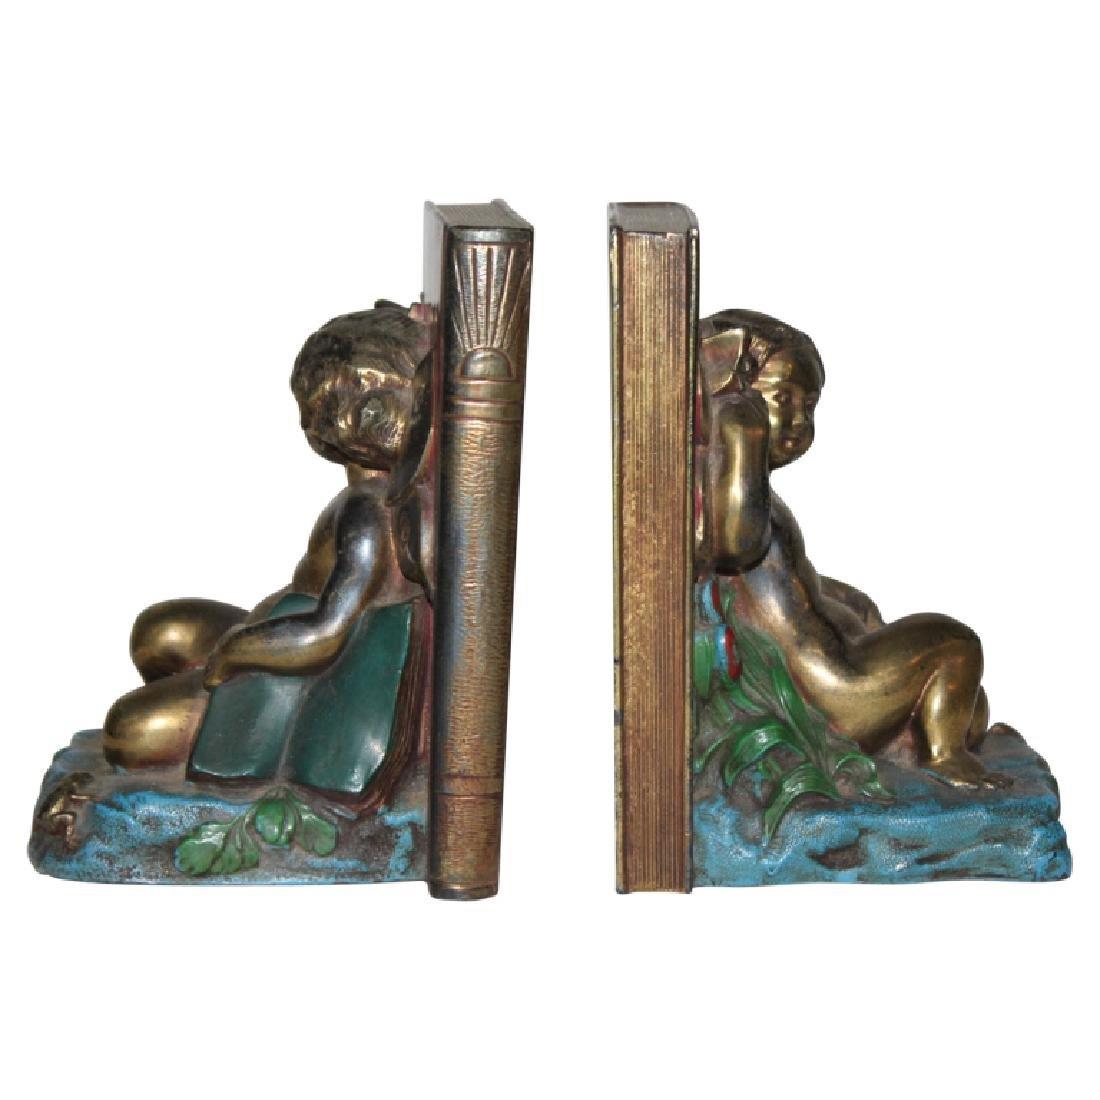 Pair of Bronze Cherub Bookends